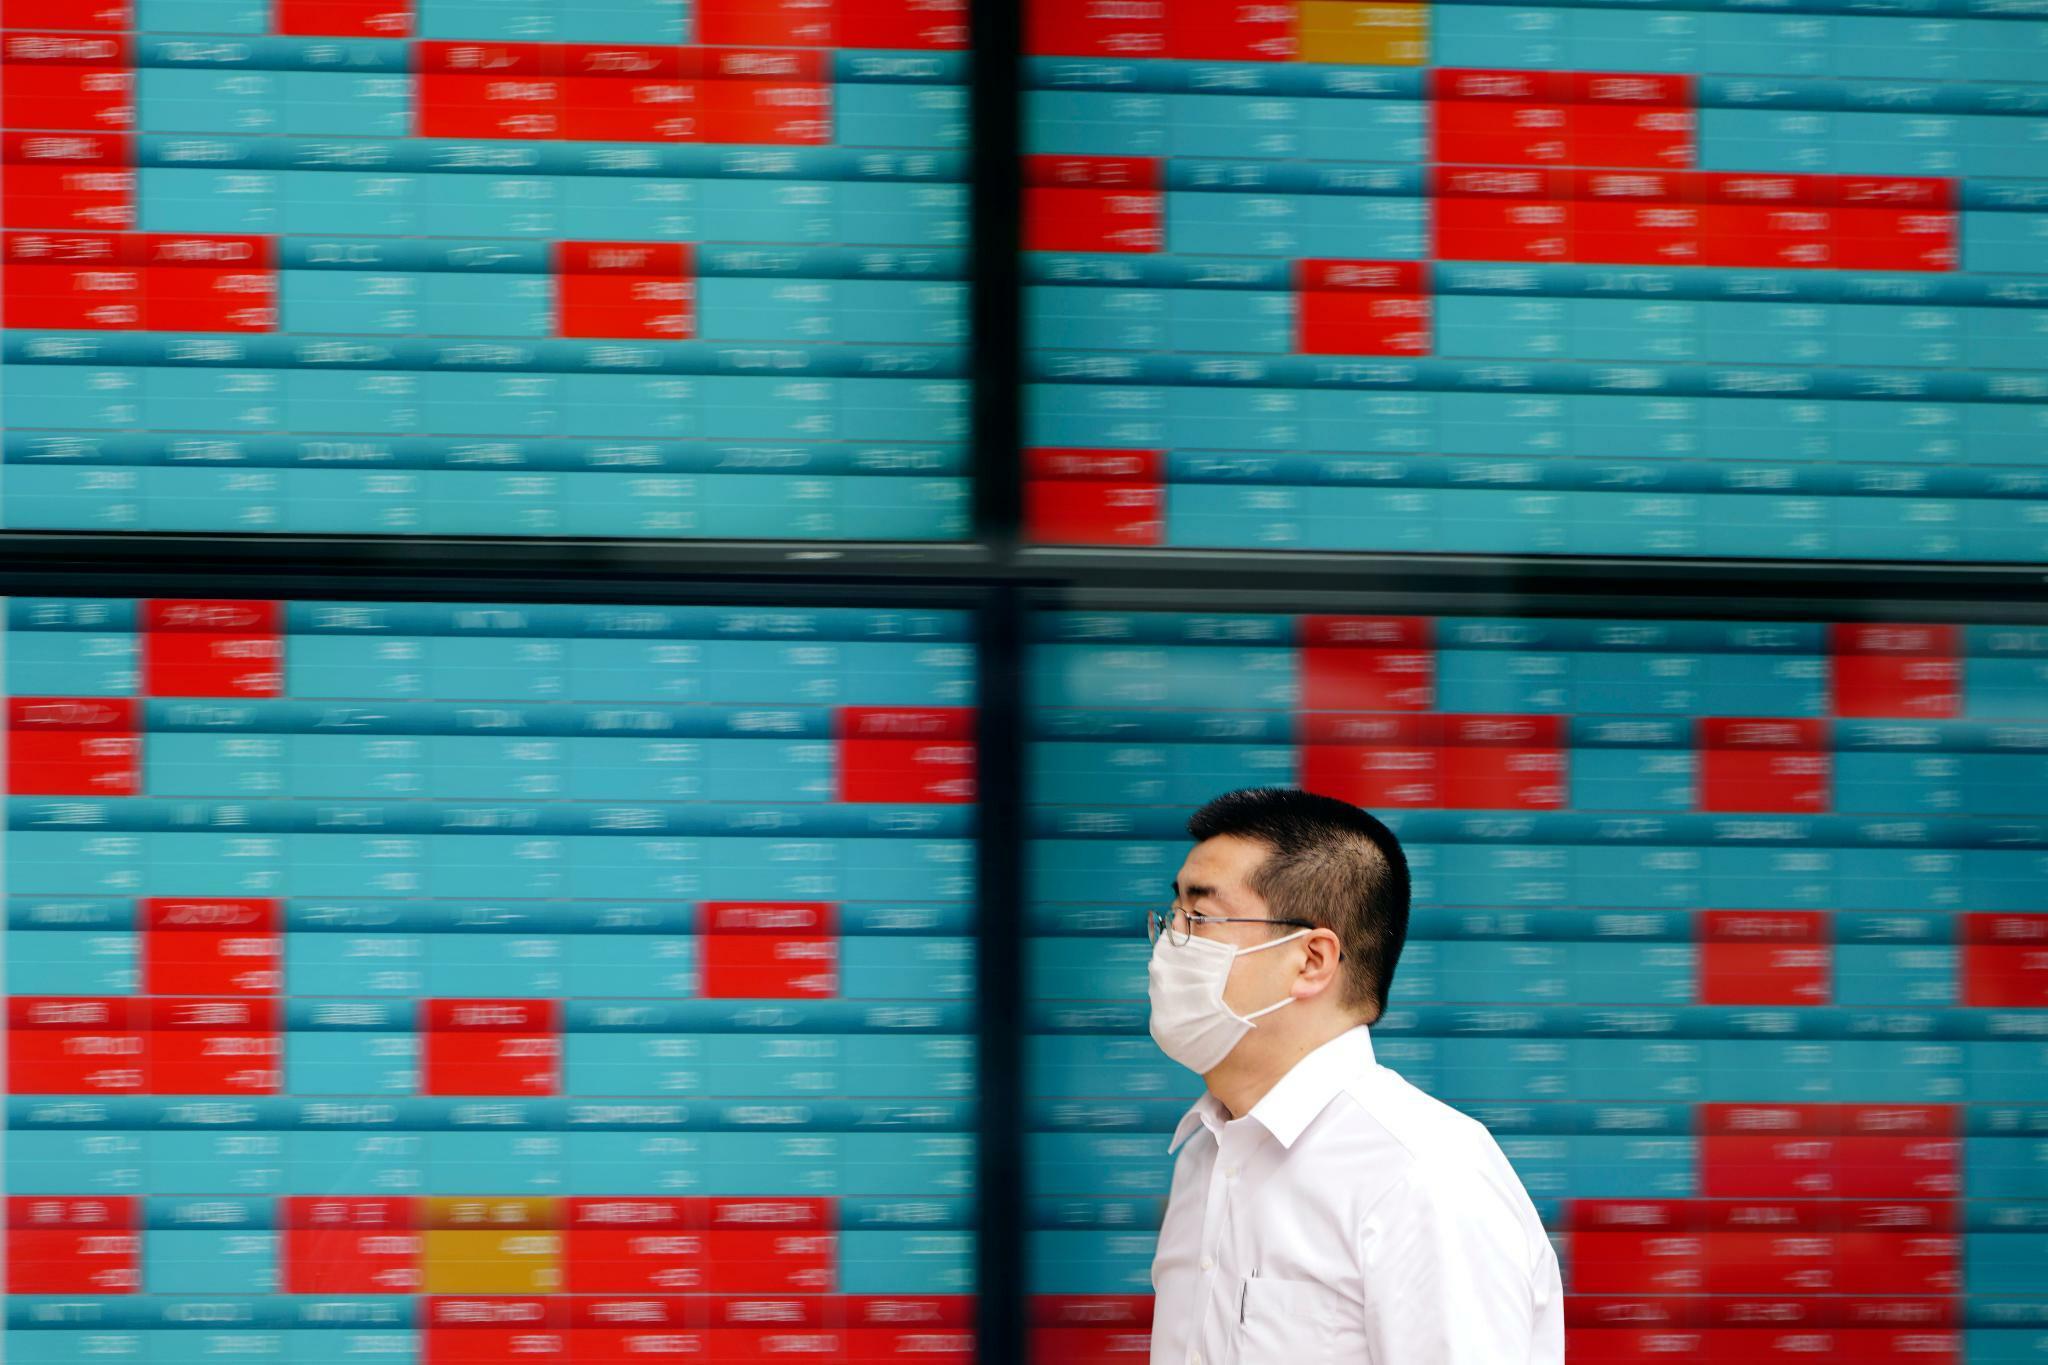 Nikkei, Topix & Co.: Anleger in Asien setzen auf Konjunkturhilfe der Notenbanken